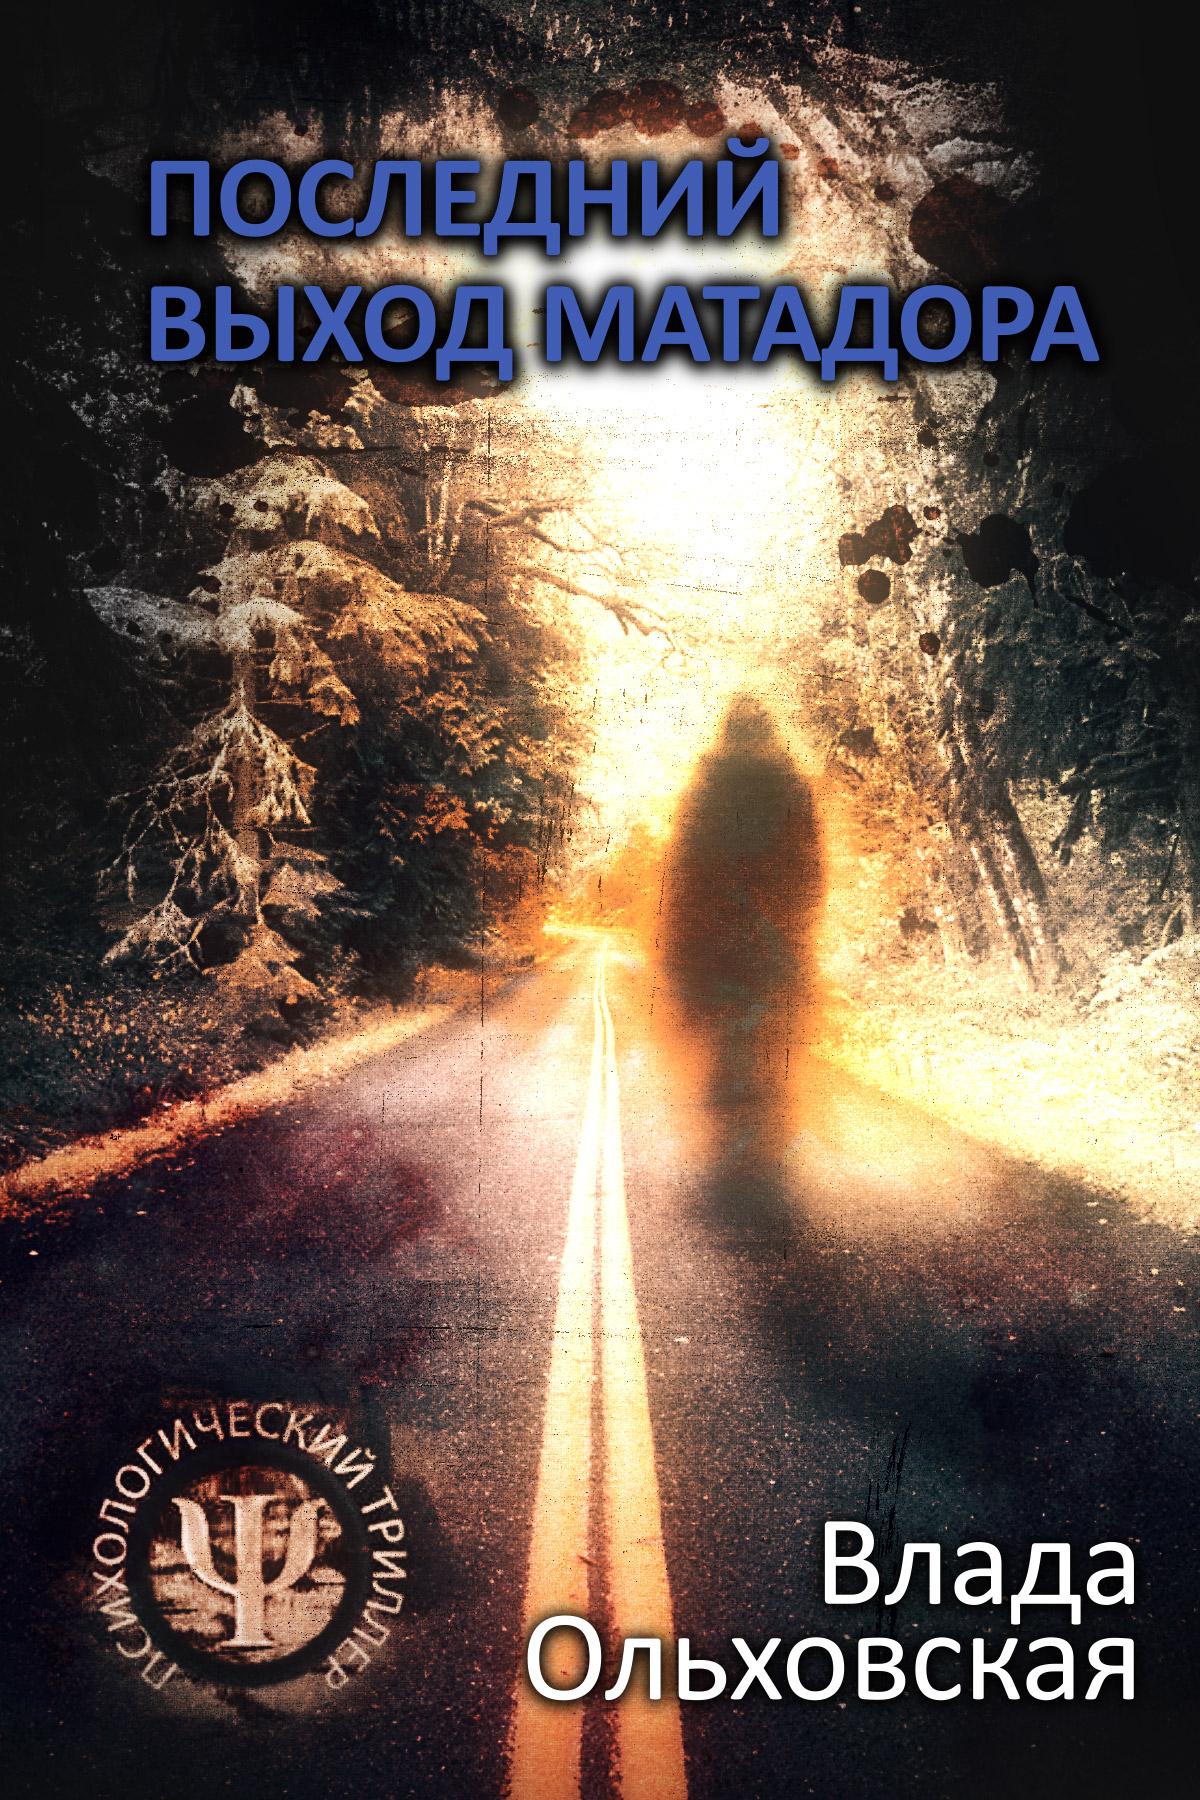 Последний выход Матадора